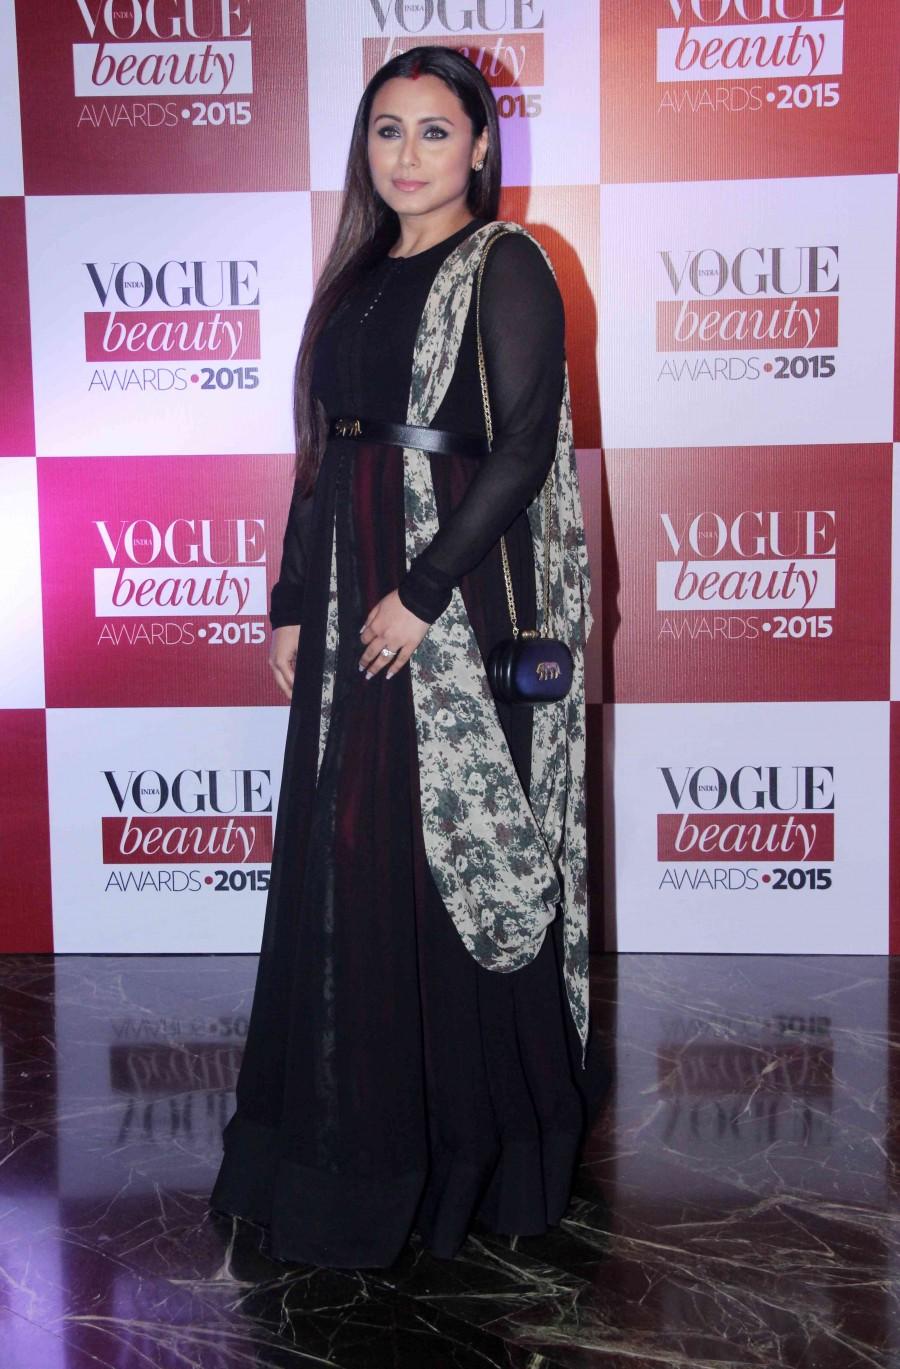 Rani mukerji,vogue beauty awards 2015,rani mukerji red carpet,rani mukherji photos